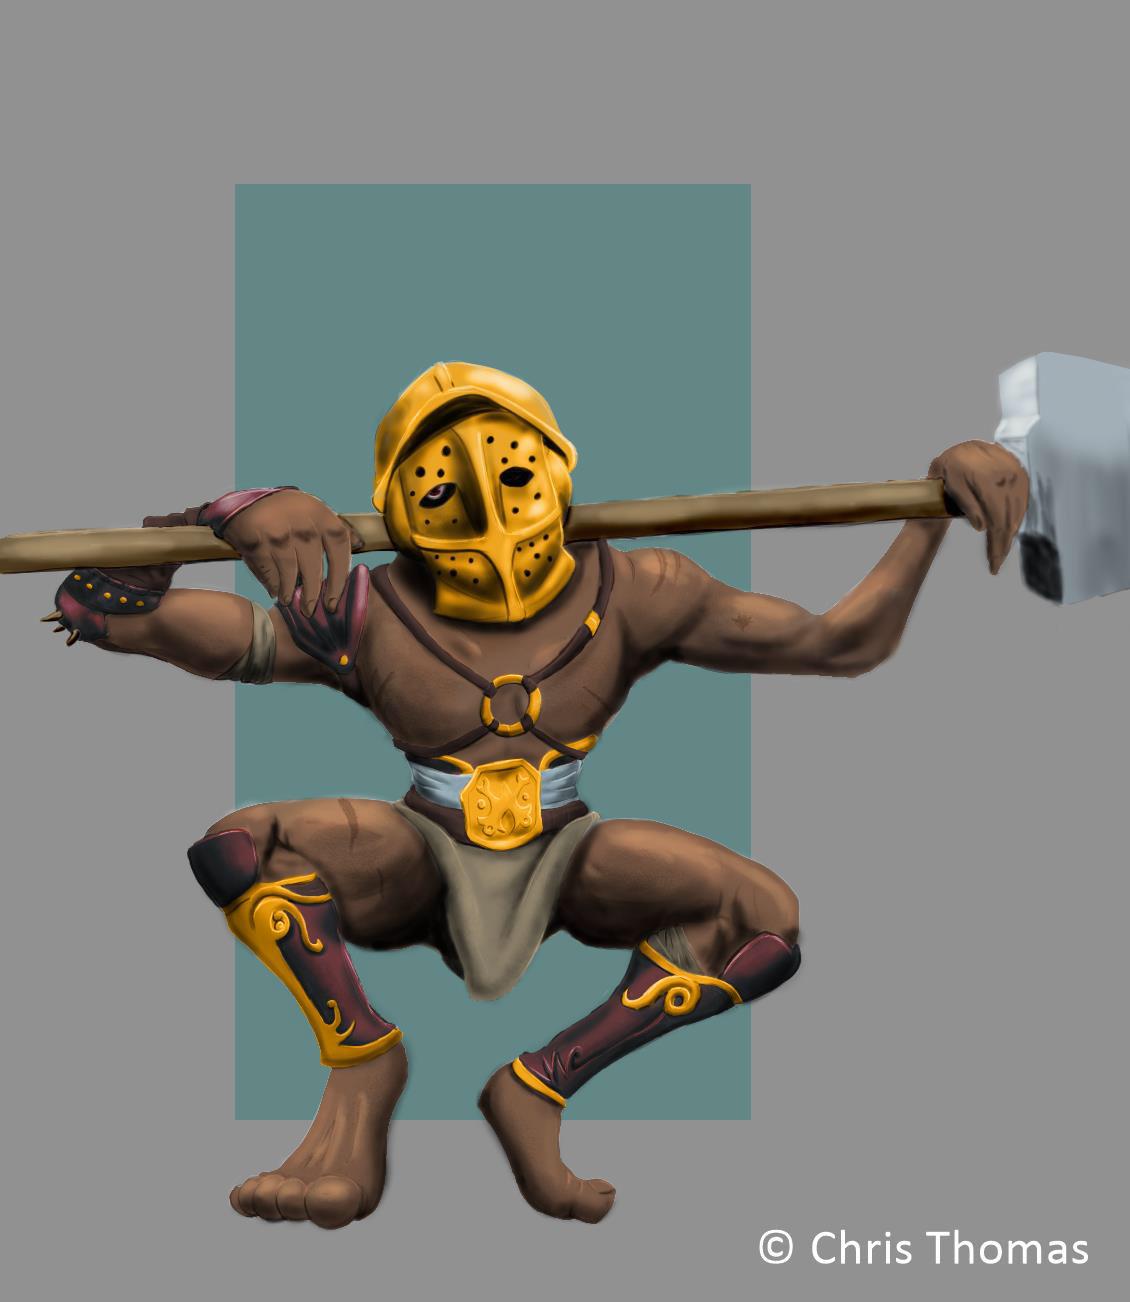 Gladiator Merman samurai wacom Character design  digital illustration